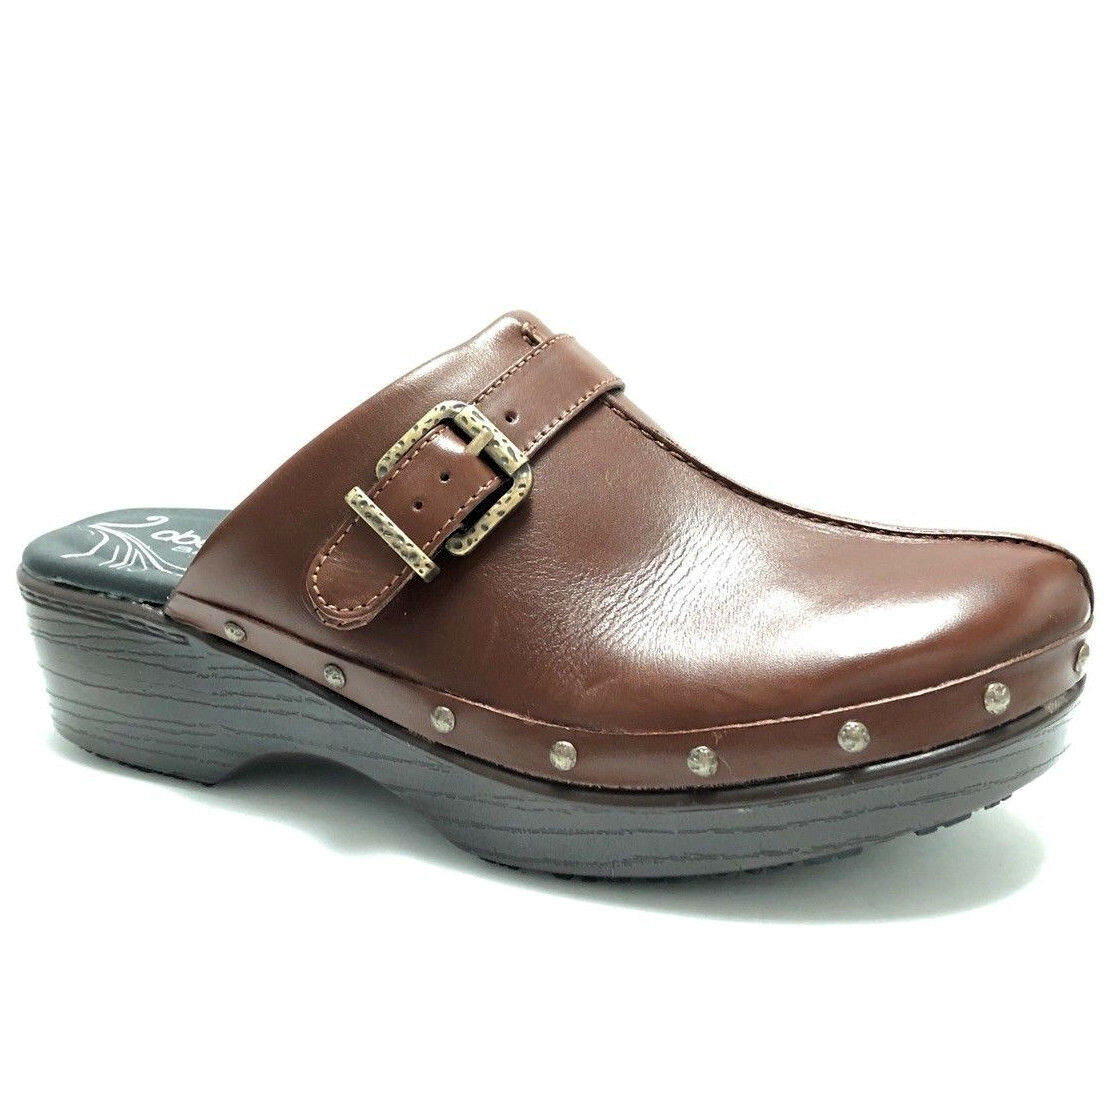 Abeo Clogs Wouomo  Clogs Mules Nursing Fay Neutrale Open Back Career Marronee Leather 8.5  economico in alta qualità